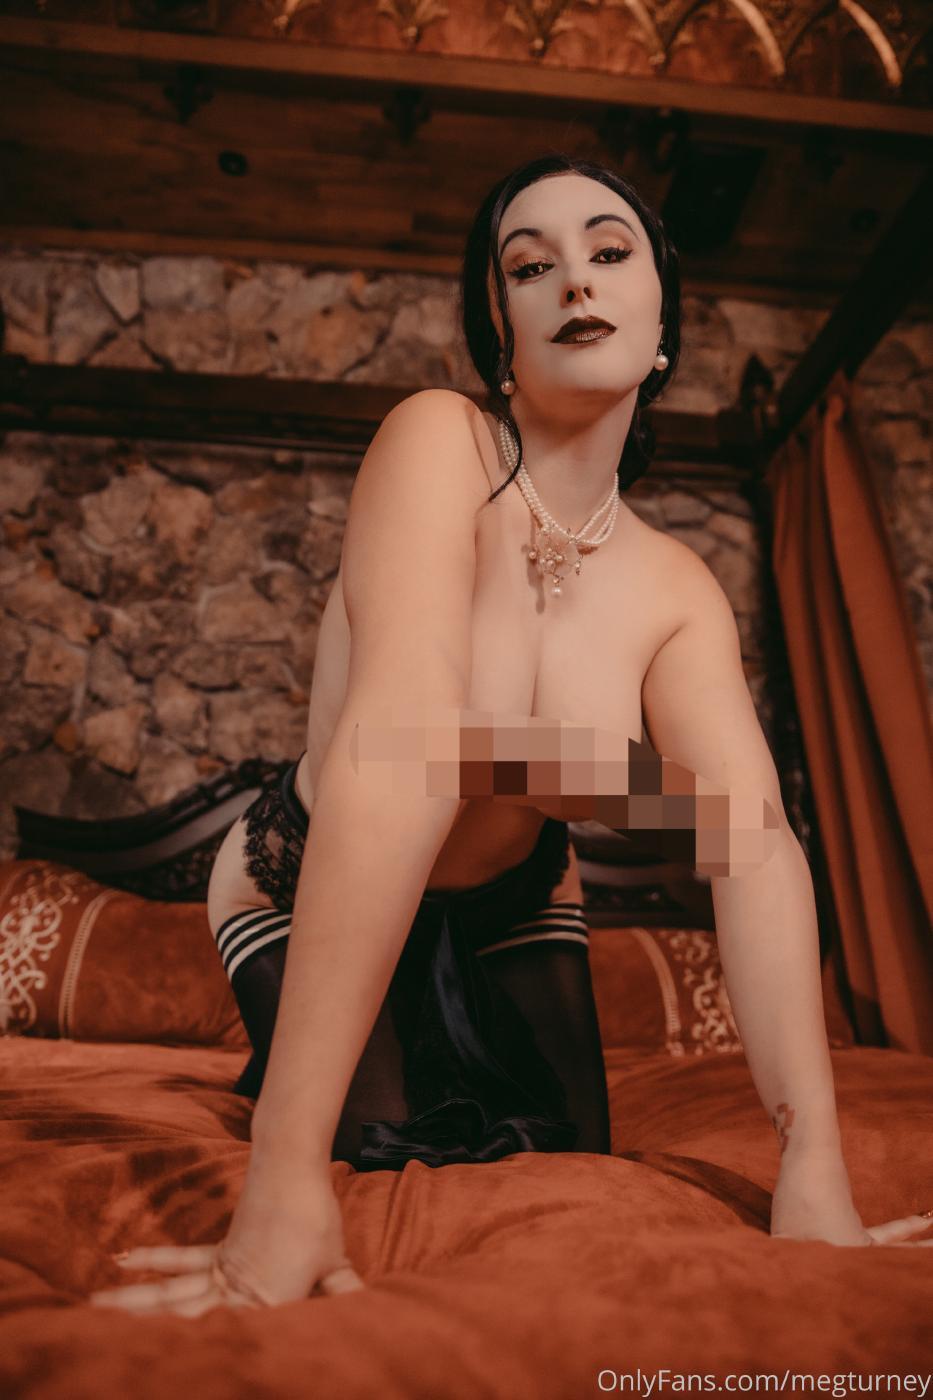 Meg Turney Lady Dimitrescu Cosplay Onlyfans Set Leaked 0031